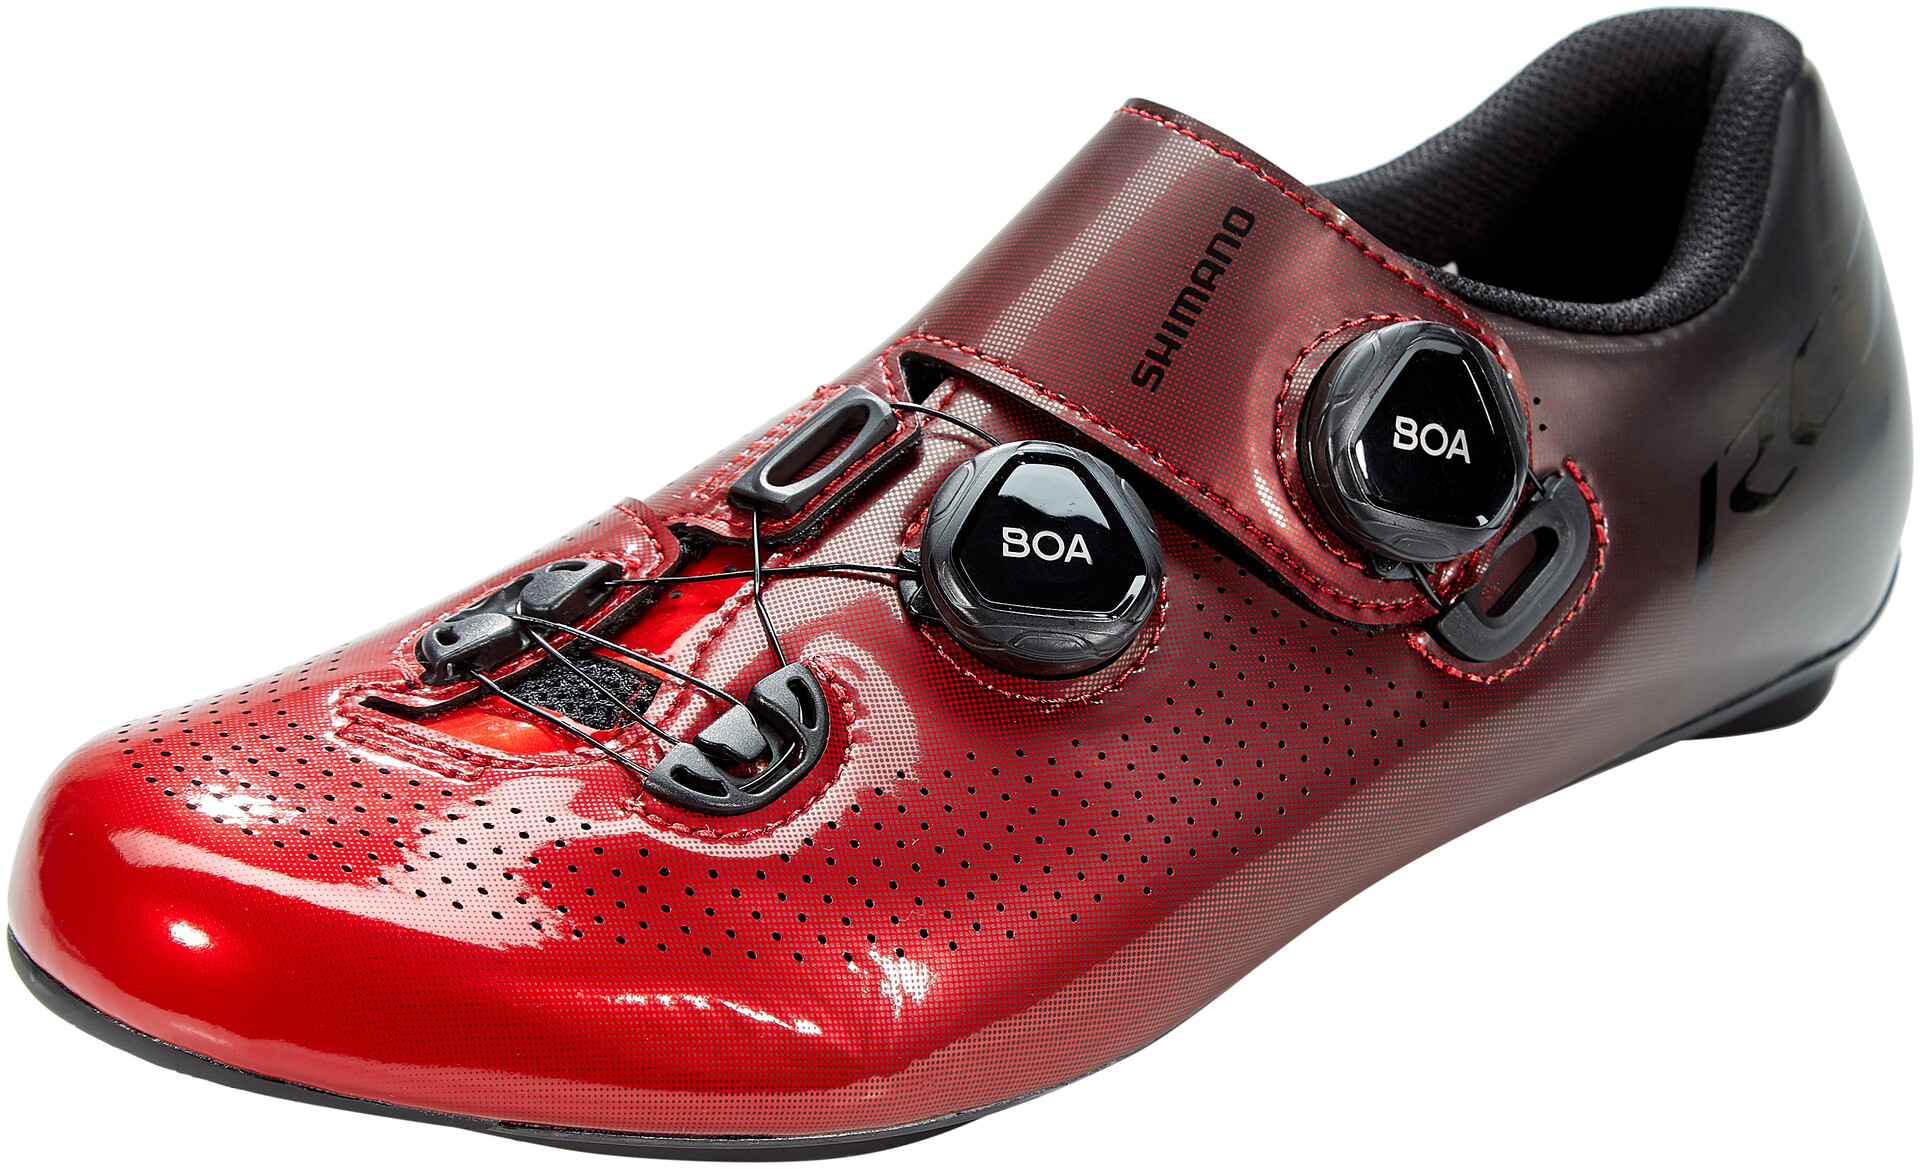 New 2019 Shimano SH-RC701 Carbon Fiber Road Cycling Shoes White EU43